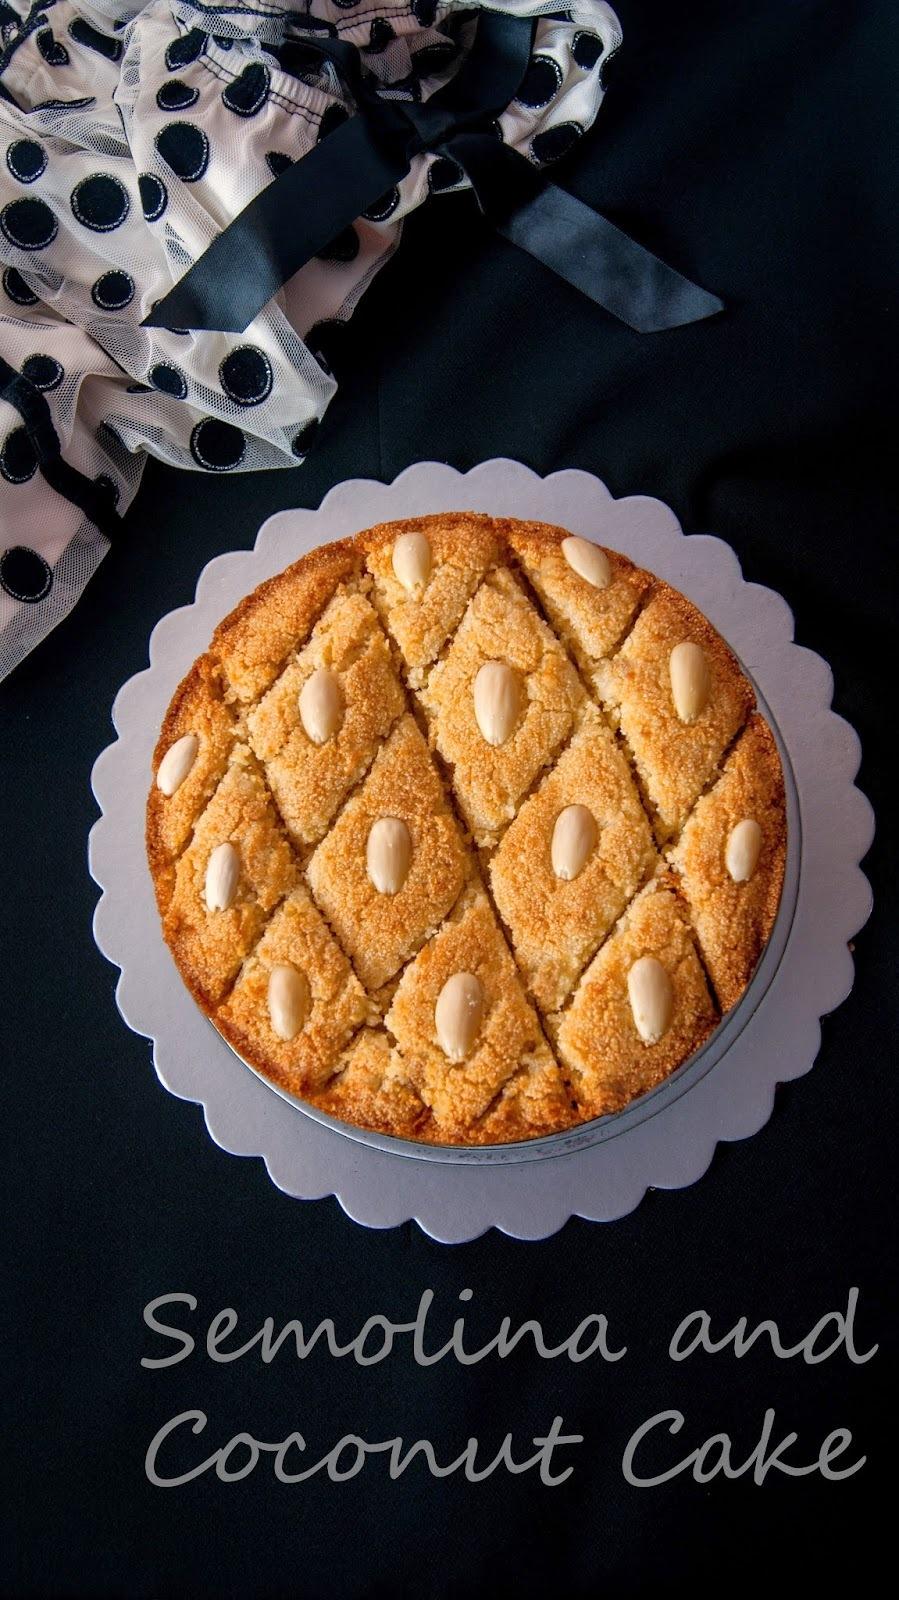 Basbousa / Semolina and Coconut Cake